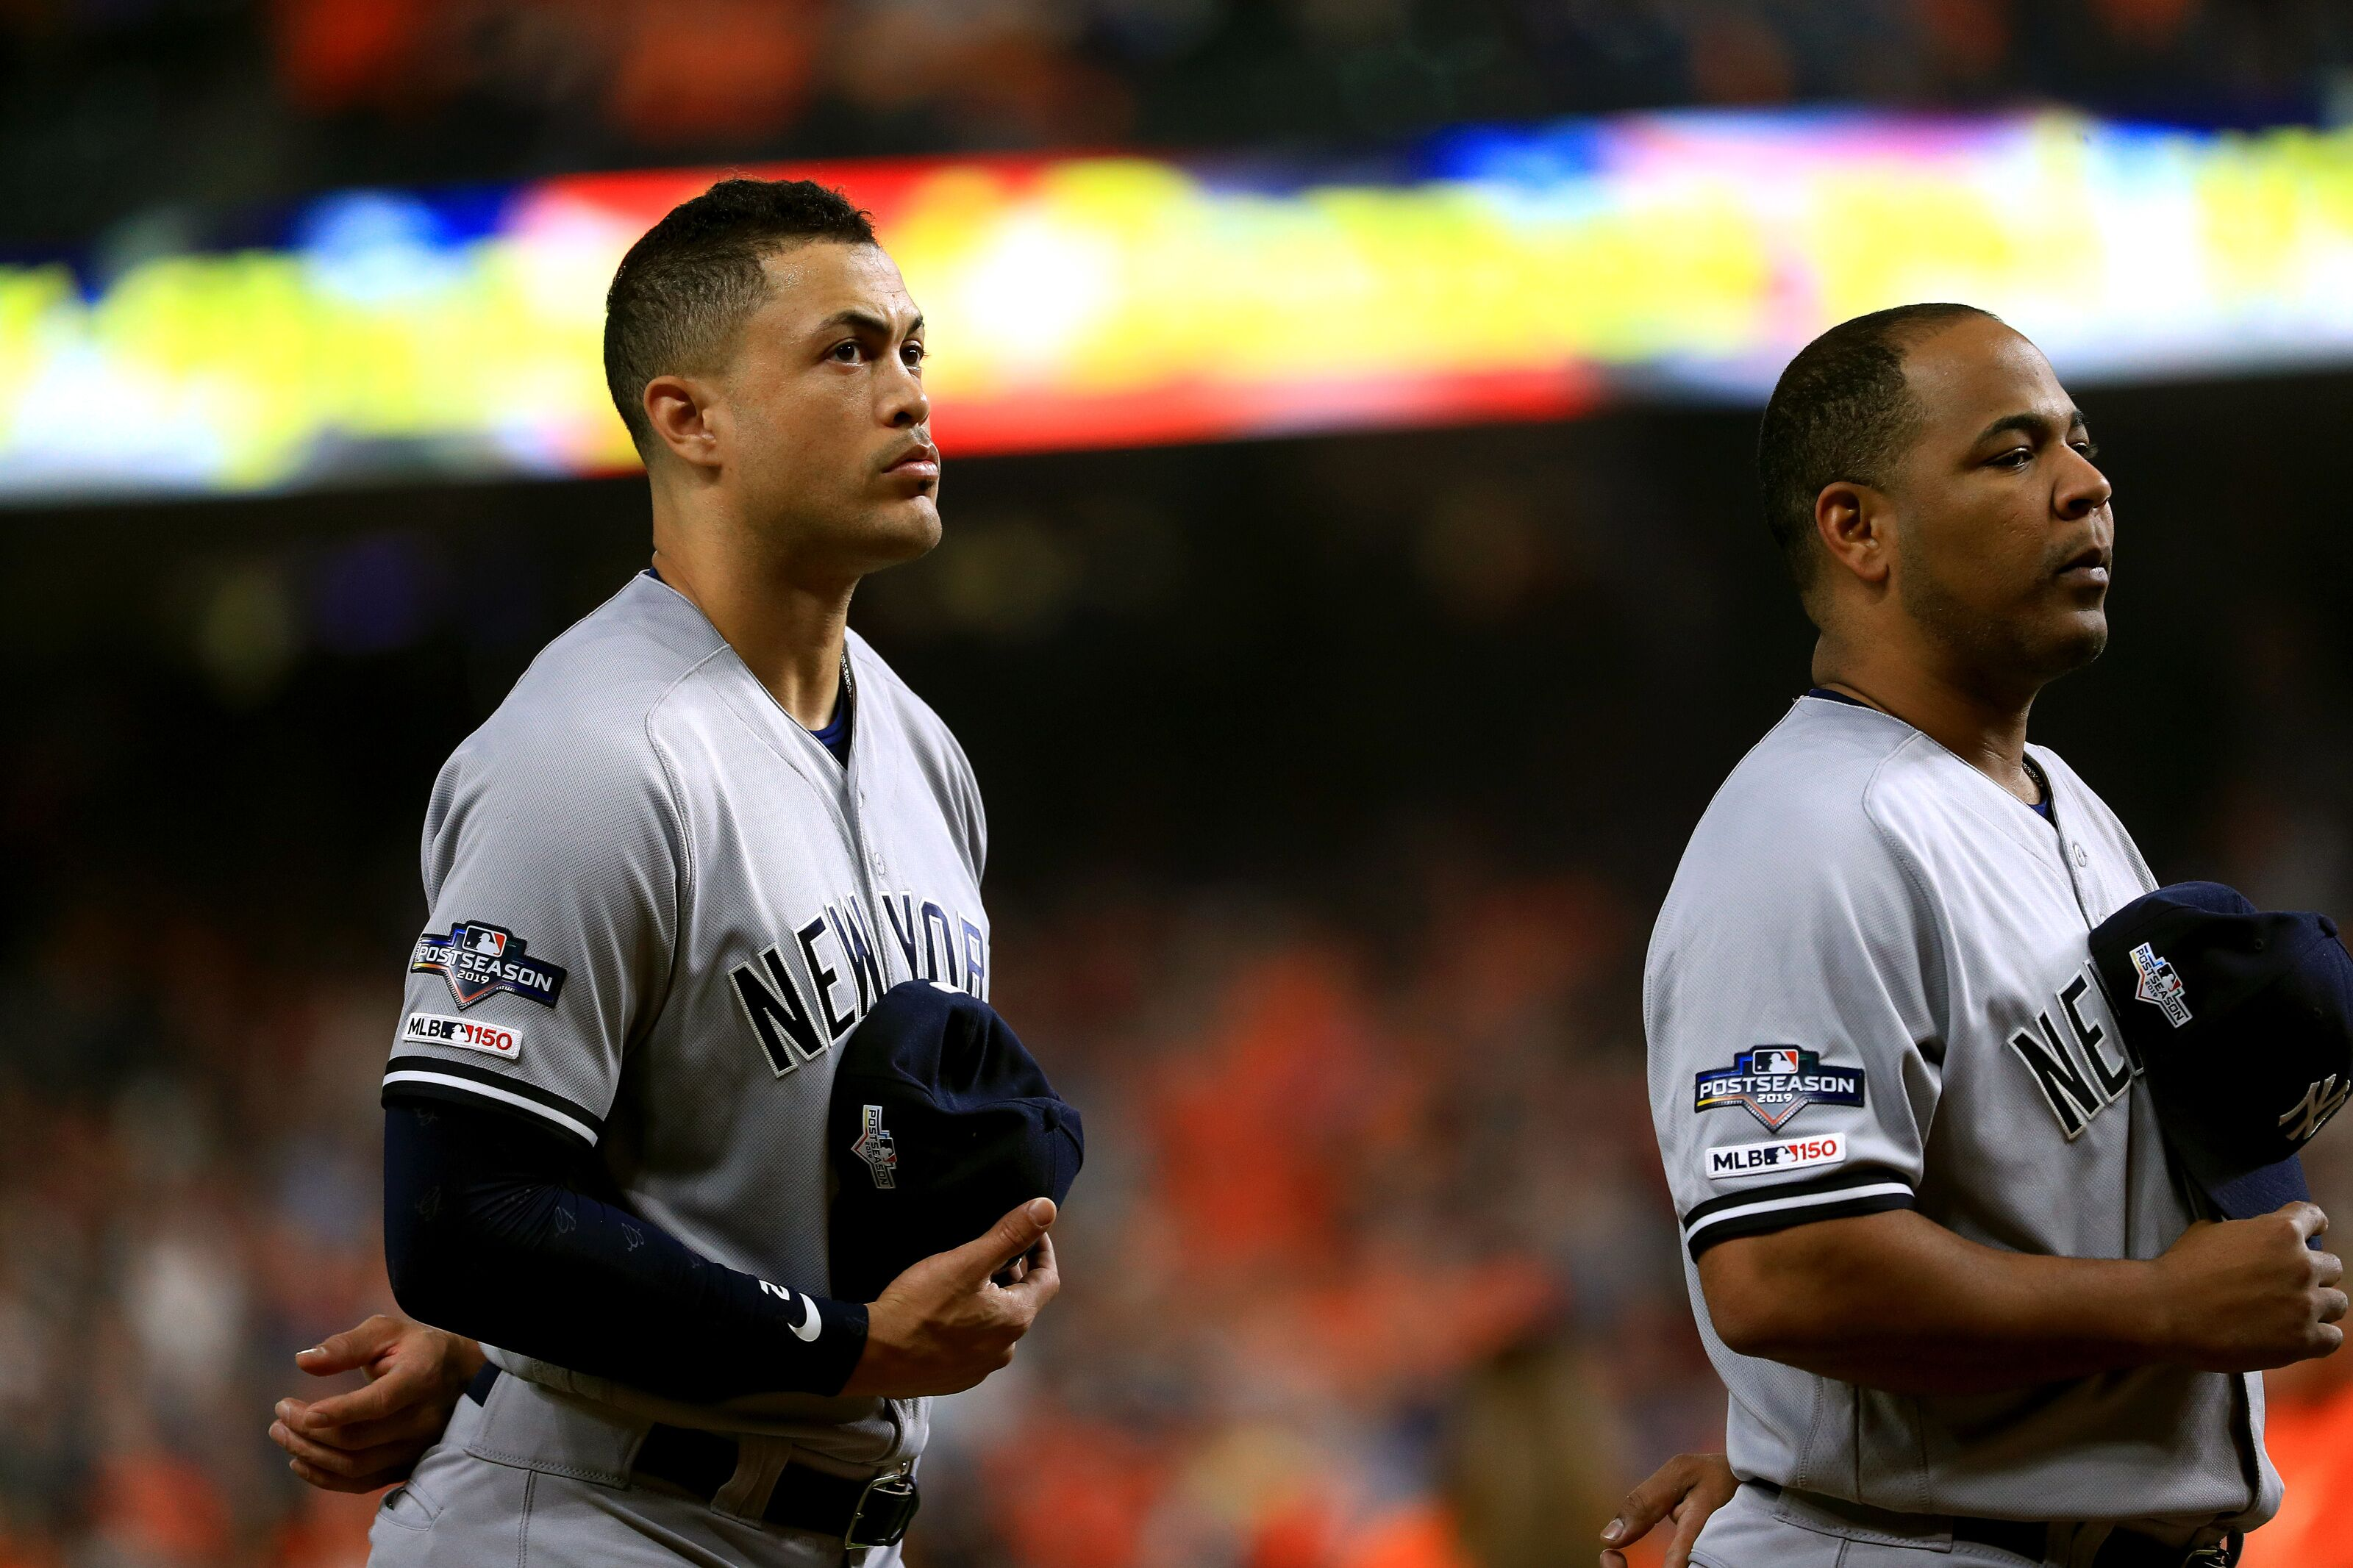 New York Yankees need to fix Giancarlo Stanton before next season